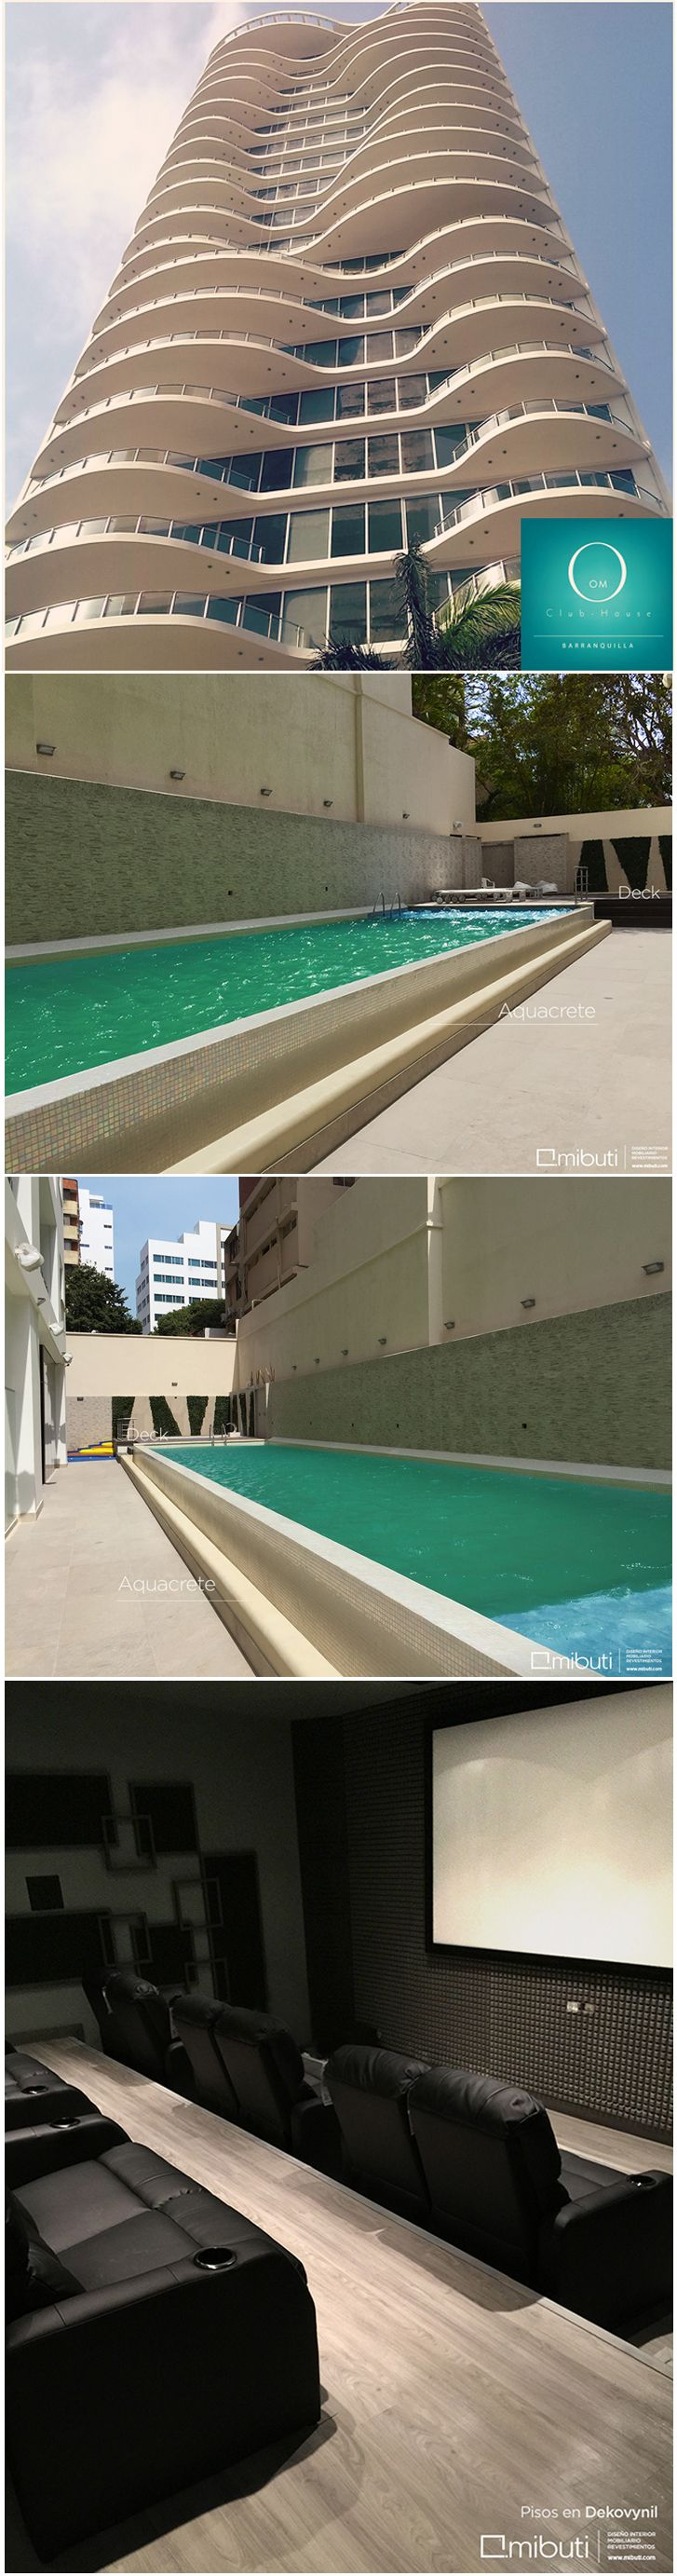 más de 25 ideas increíbles sobre escalera de piscina en pinterest